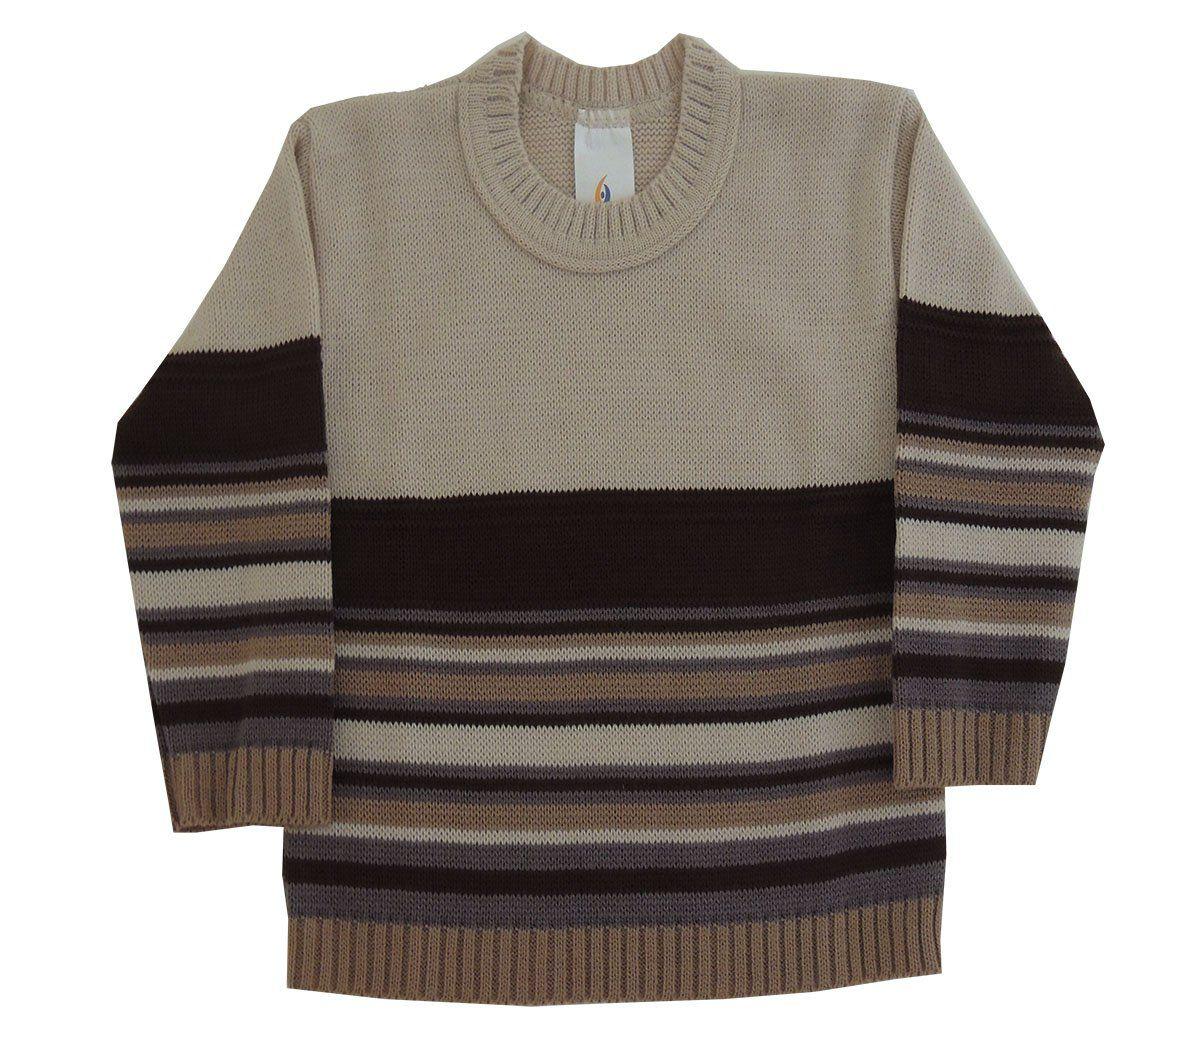 Blusa de Lã Listrado Infantil Masculino